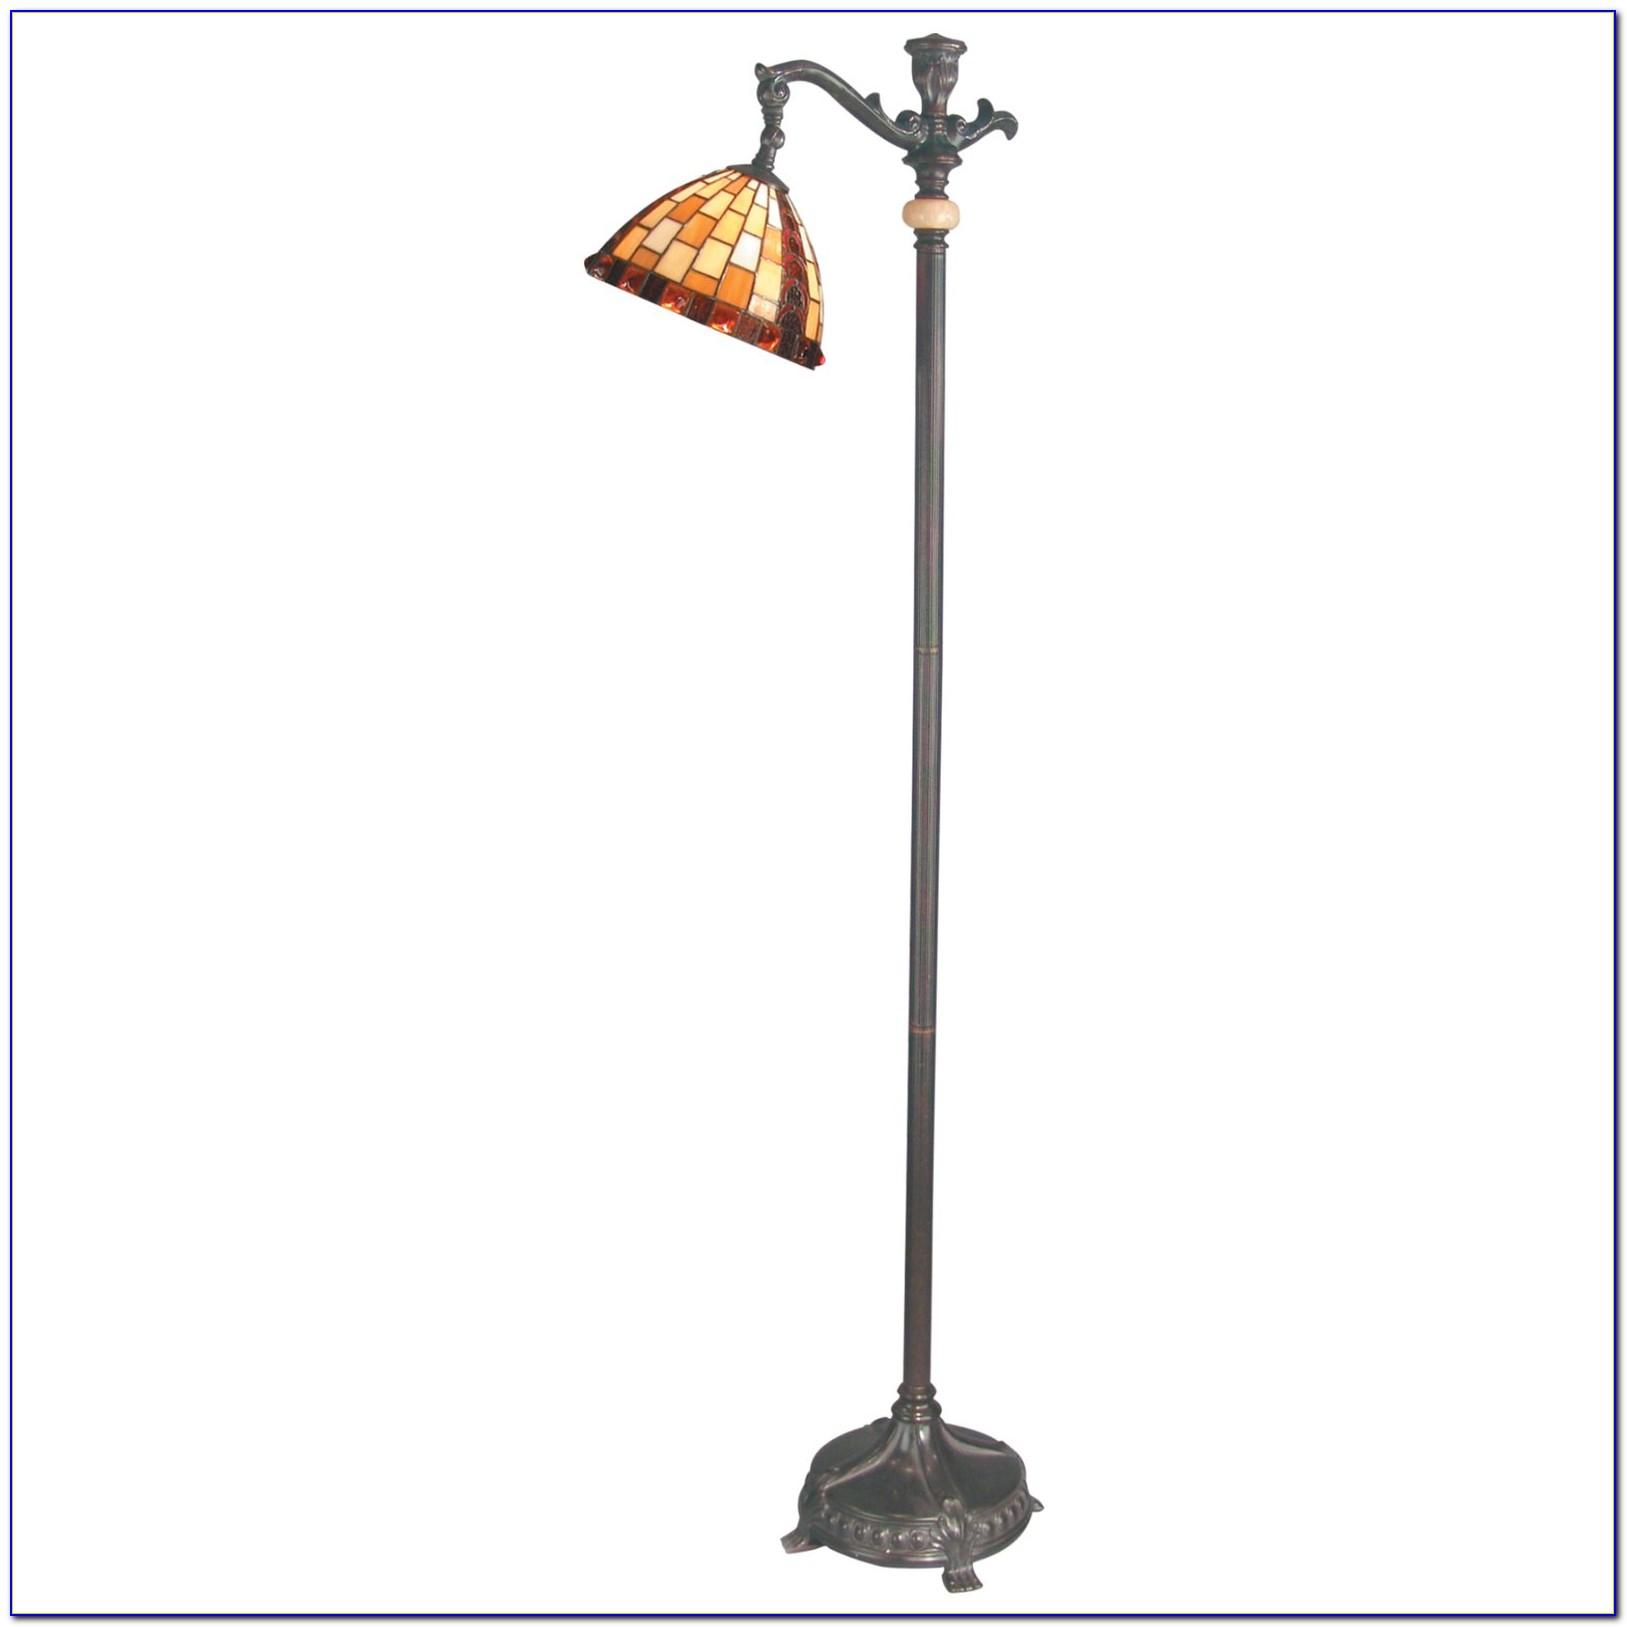 Dale Tiffany Floor Lamps